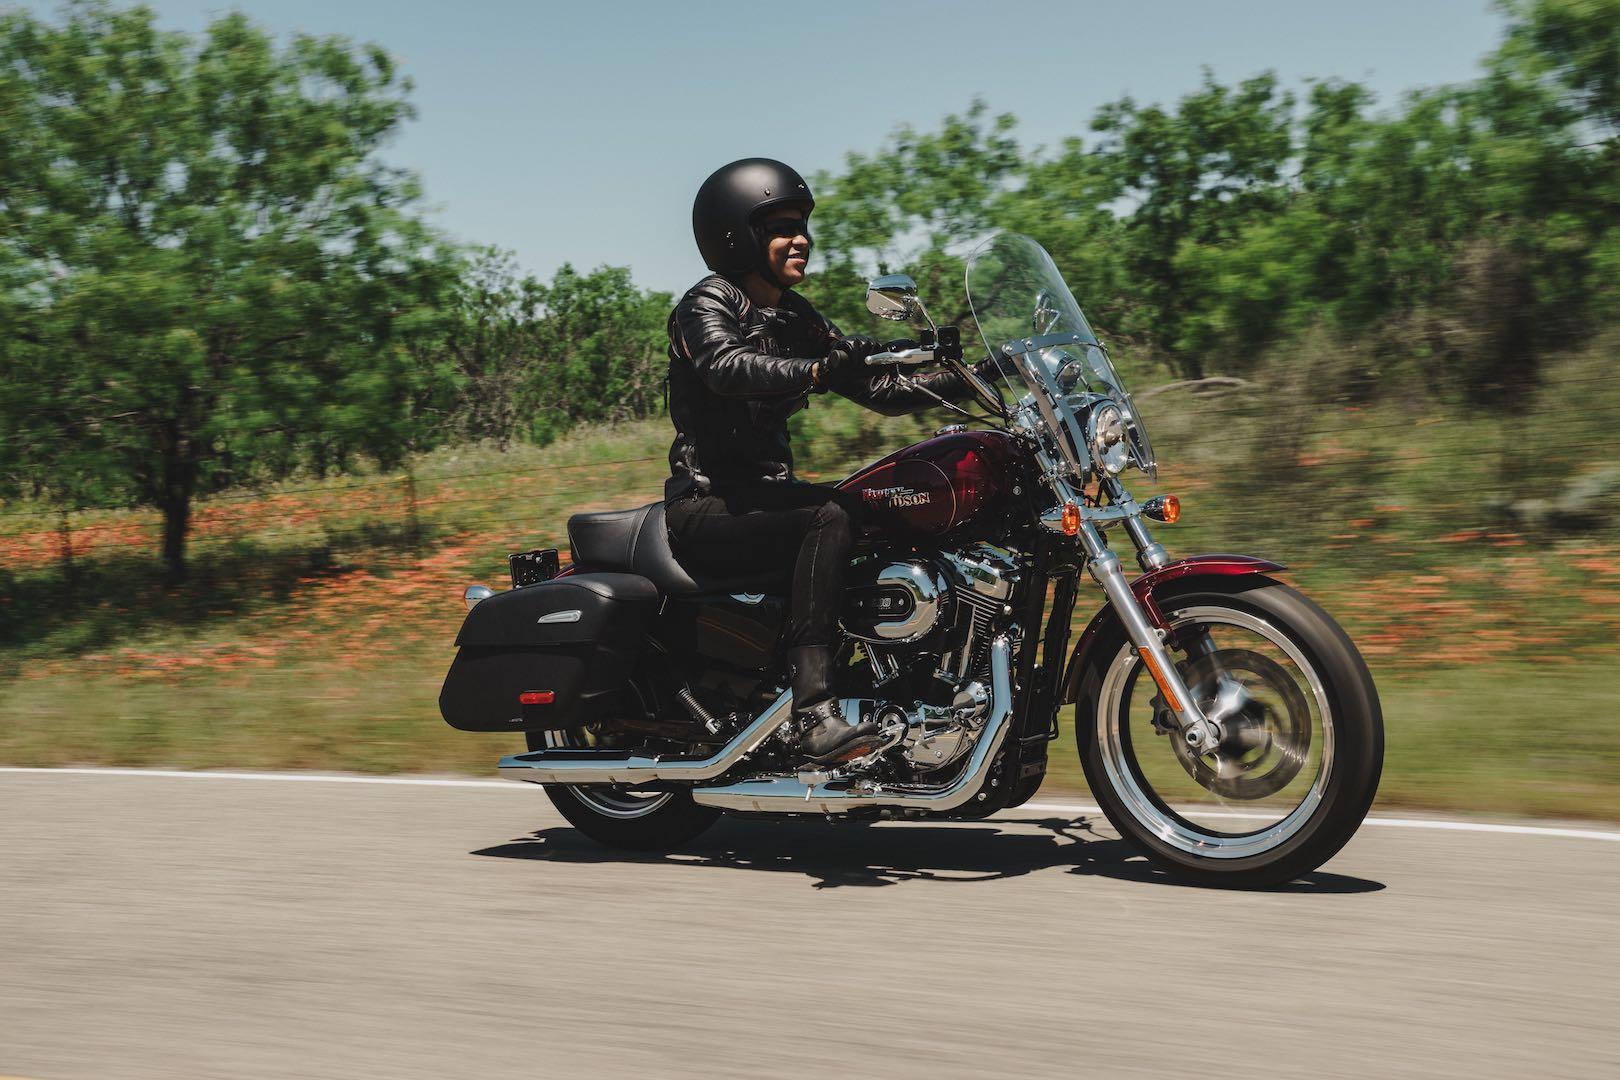 2017 Harley-Davidson Sportster SuperLow 1200T Buyer's Guide | Specs ...